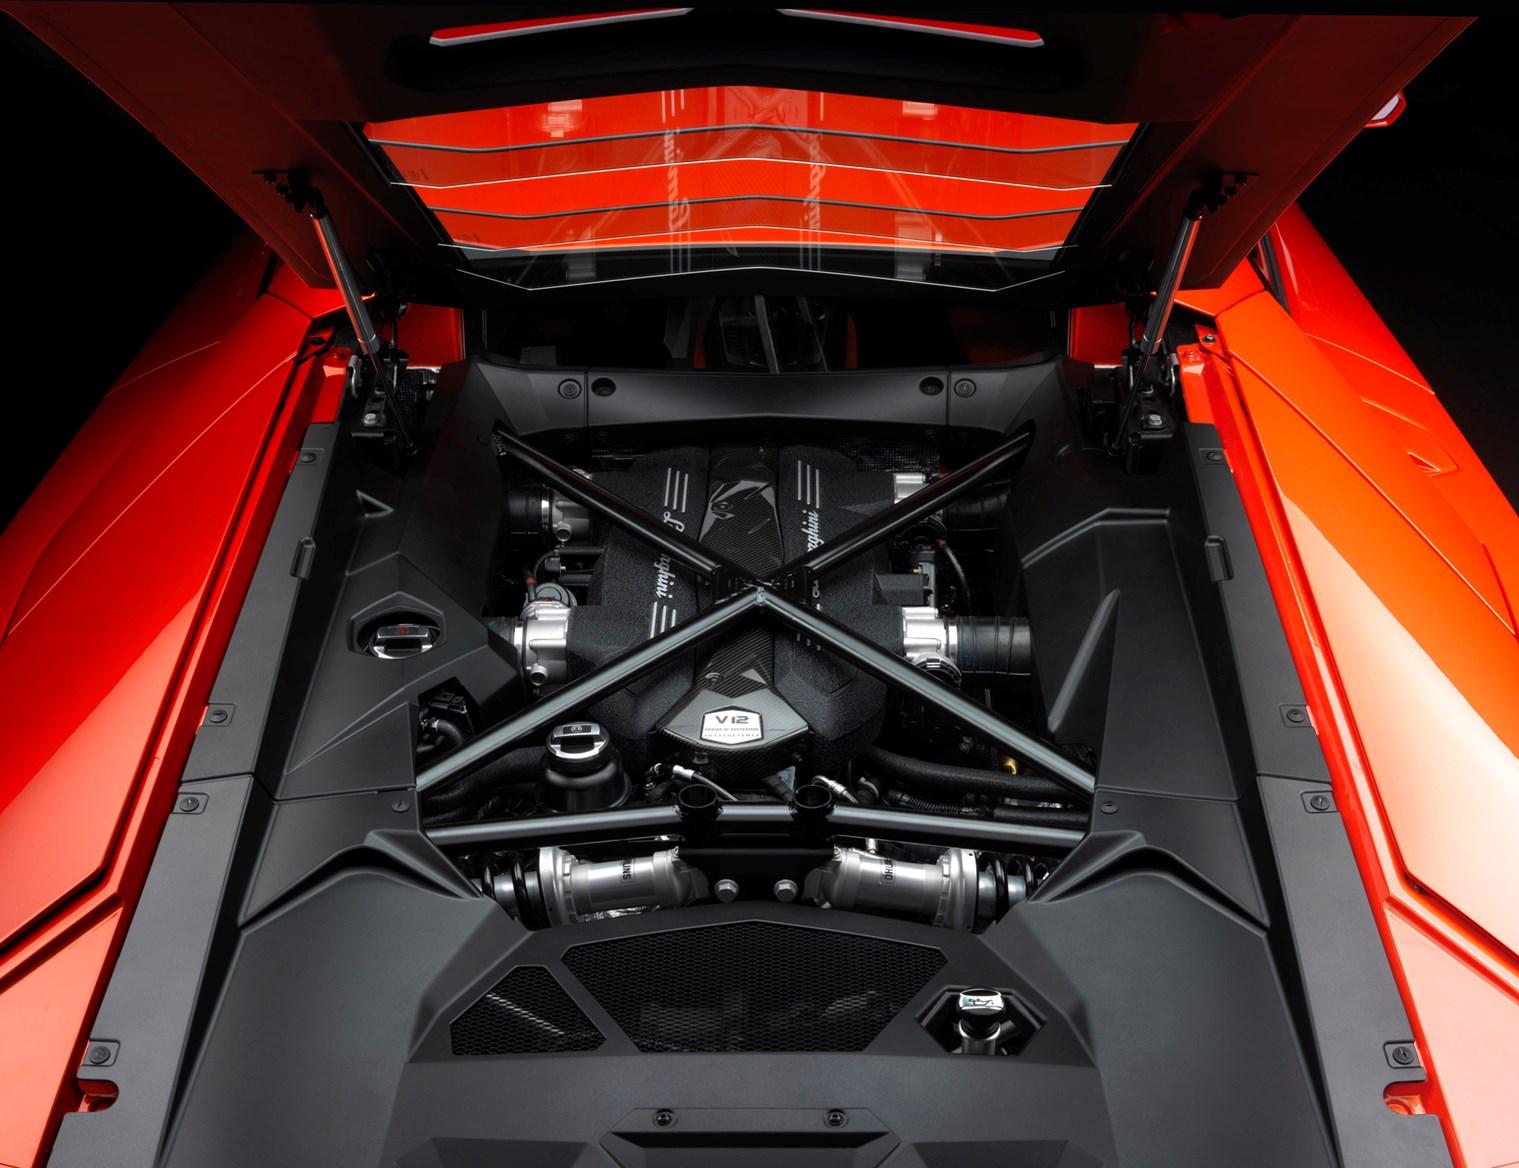 Lamborghini Aventador (2019) MPG, Running Costs, Economy